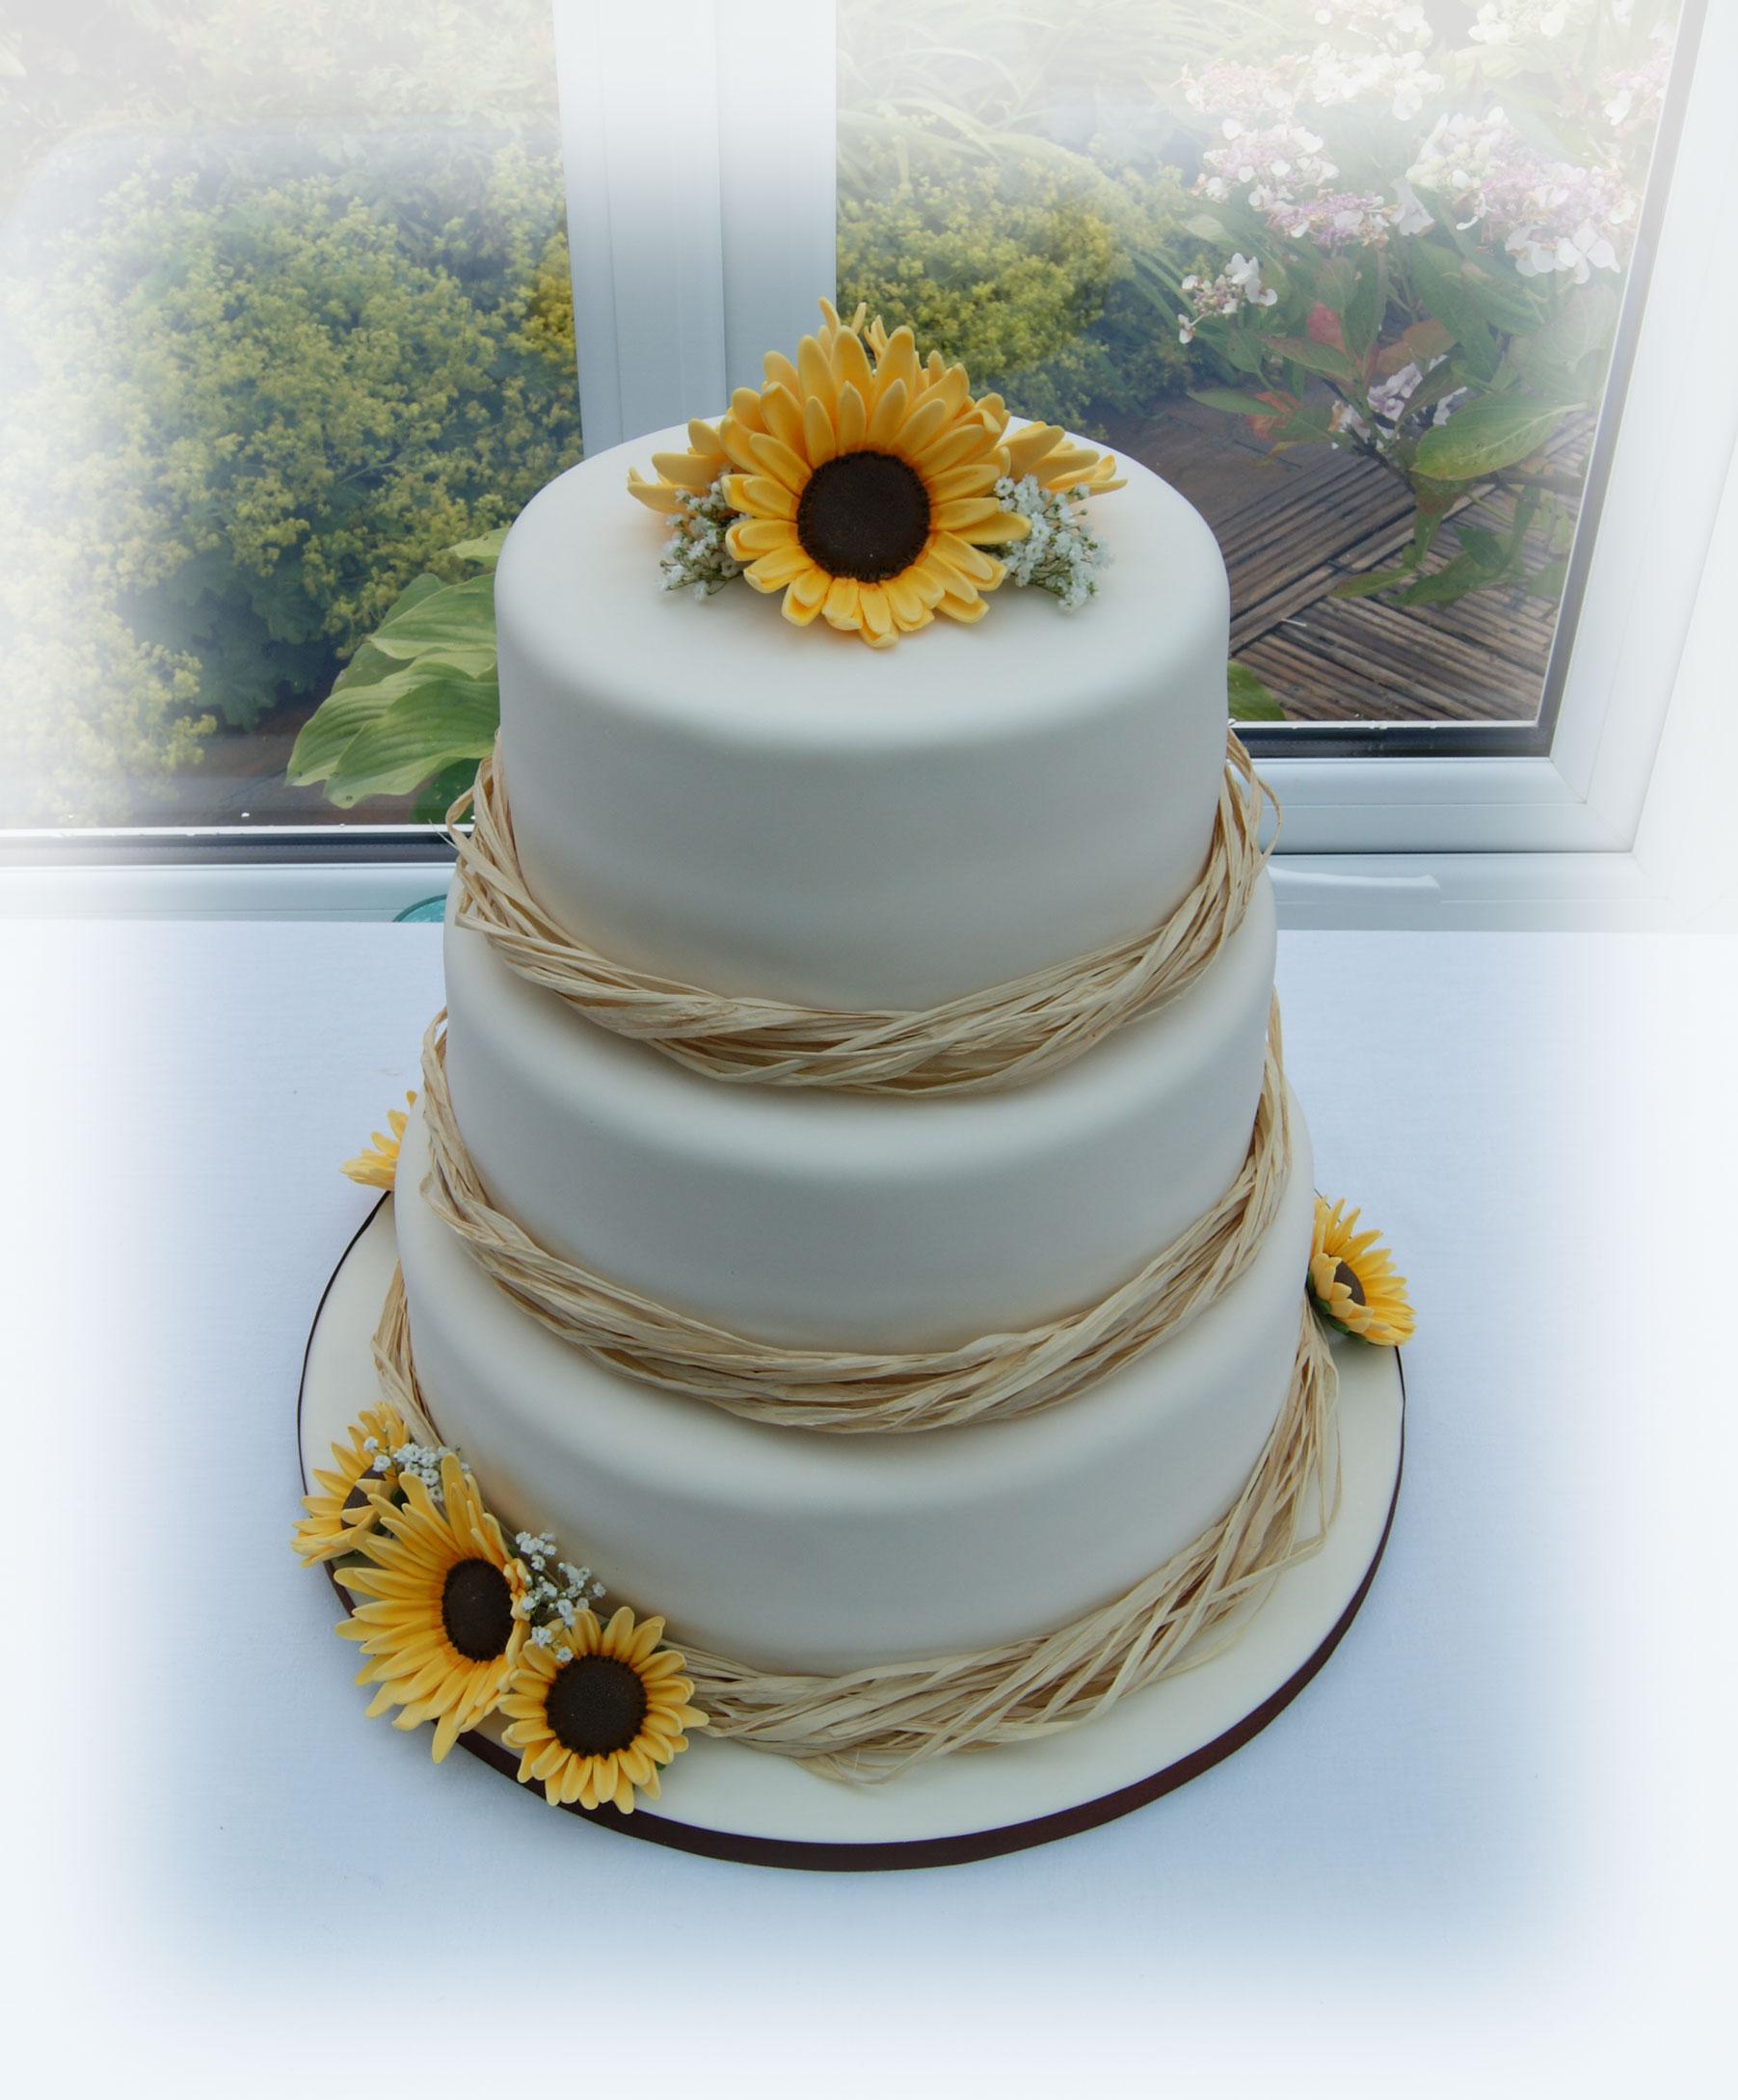 sunflower wedding cake bakealous. Black Bedroom Furniture Sets. Home Design Ideas